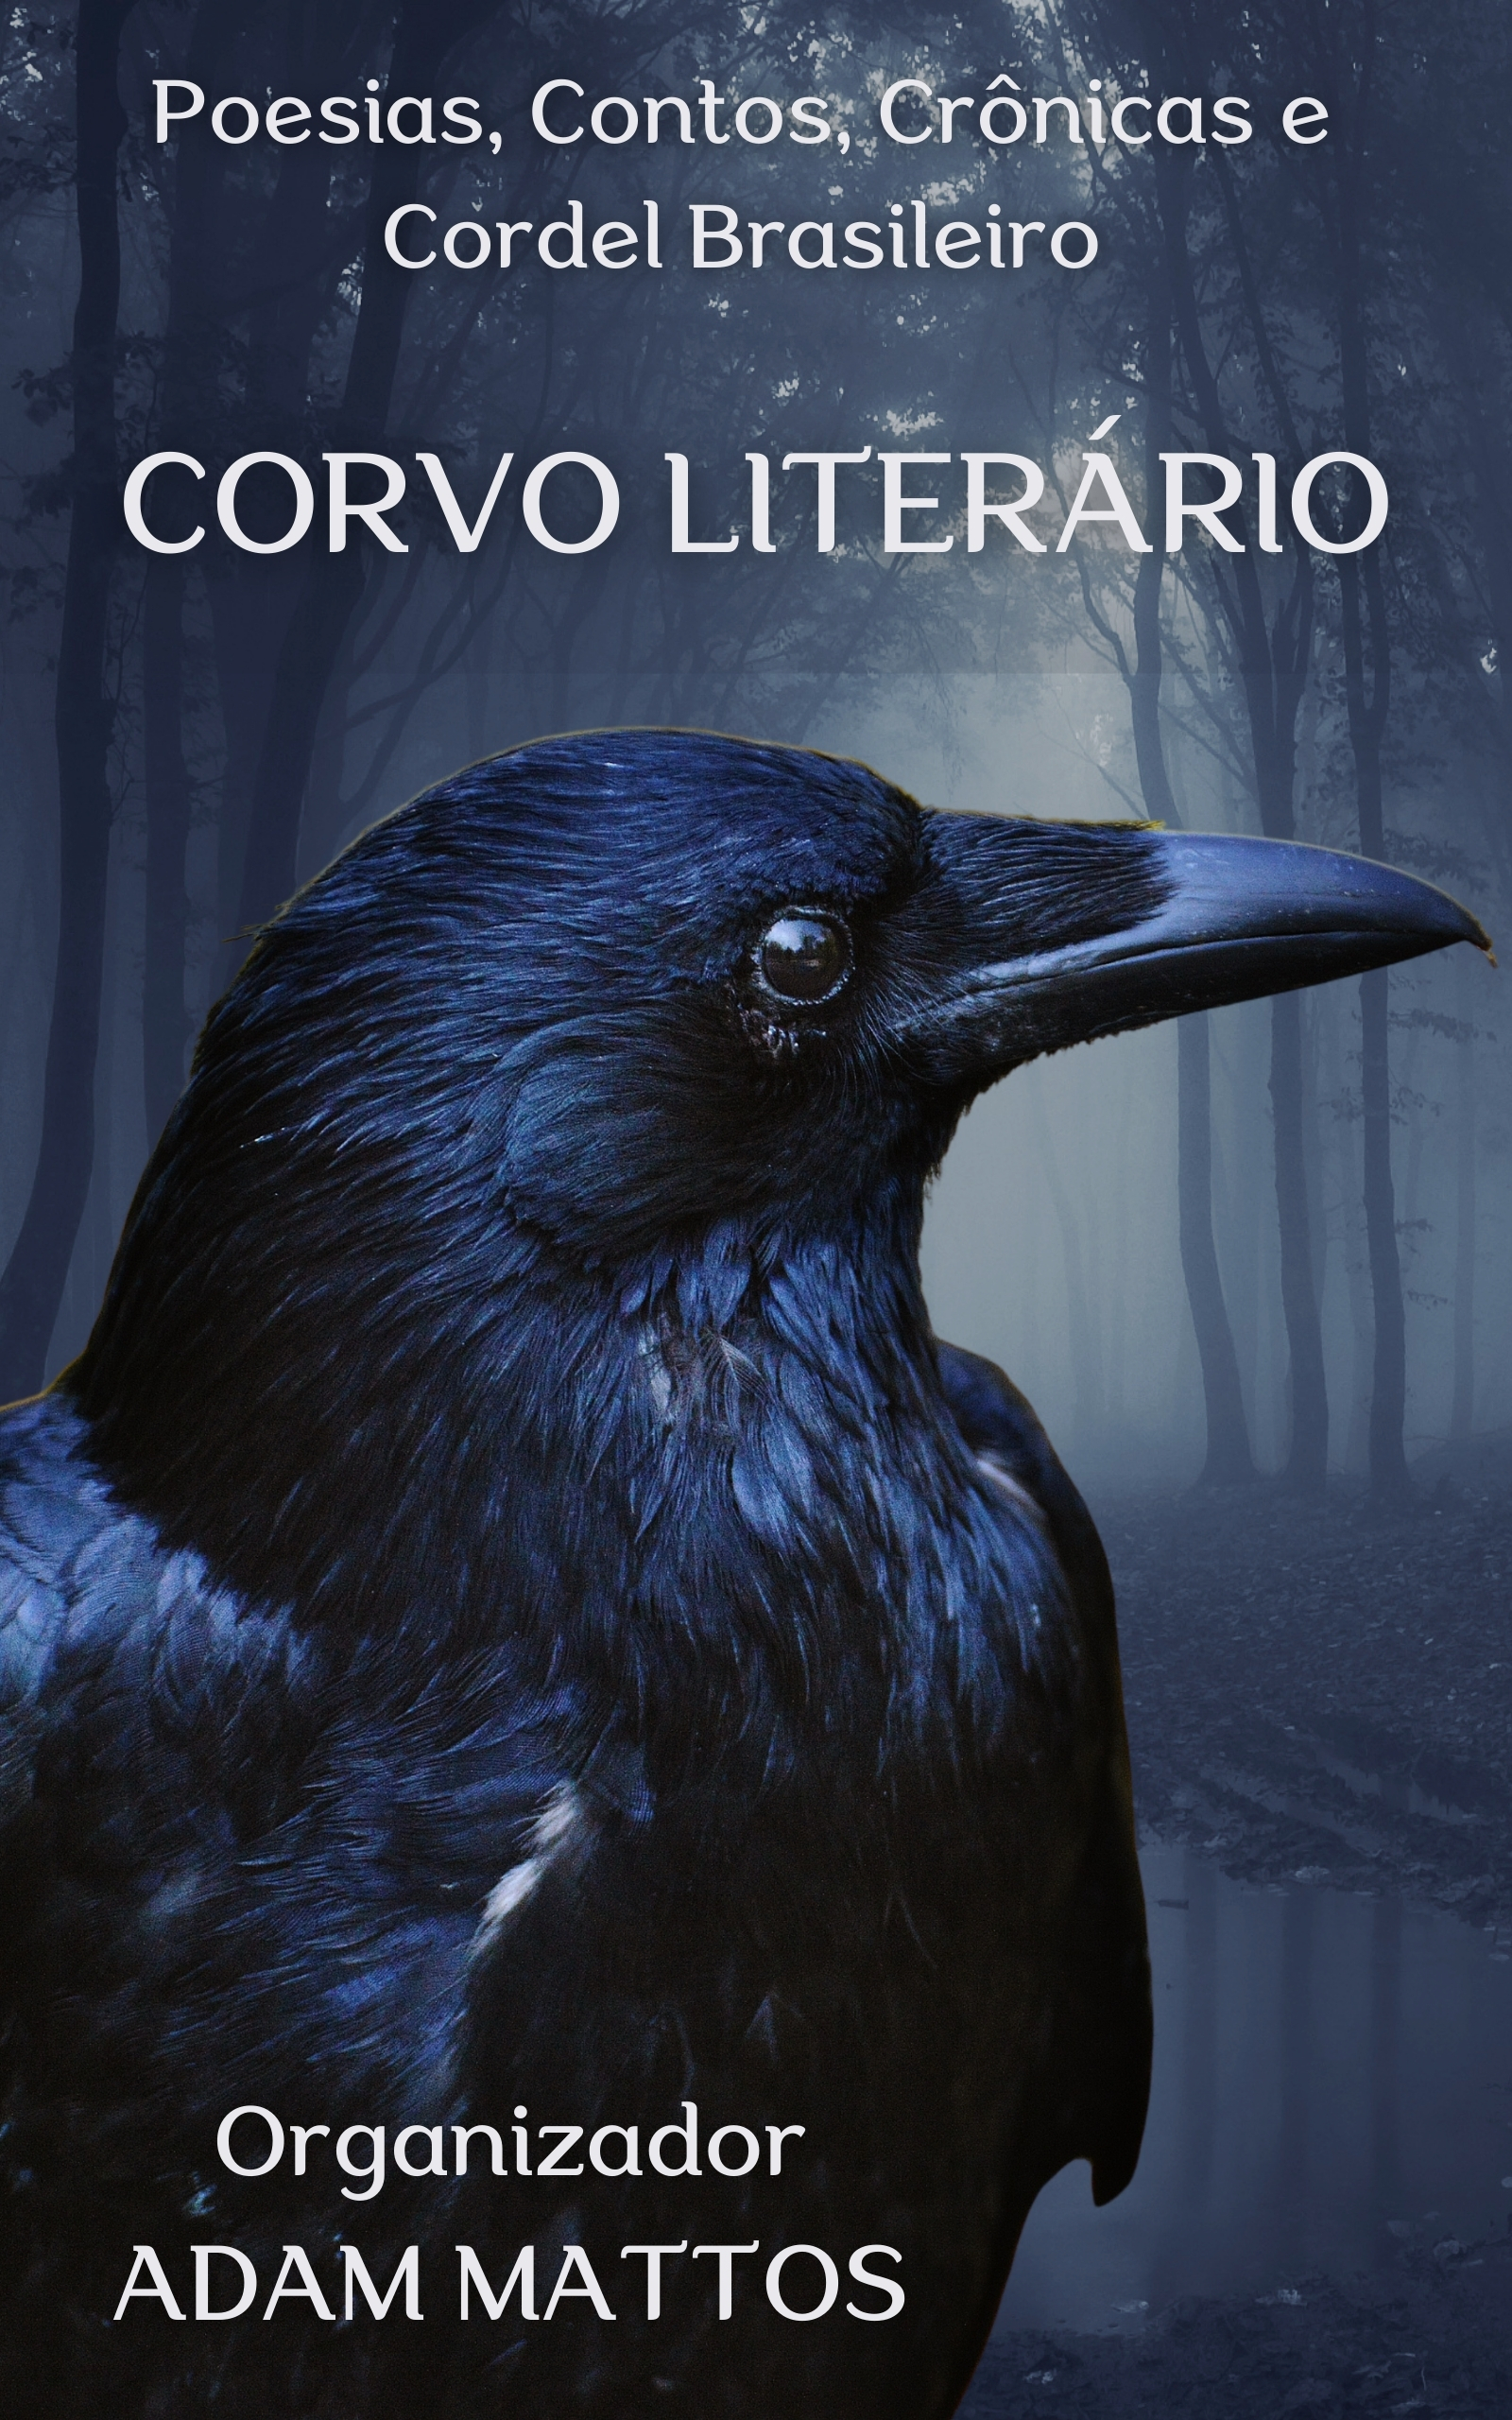 antologia-corvo-literario-capa-ebook-2